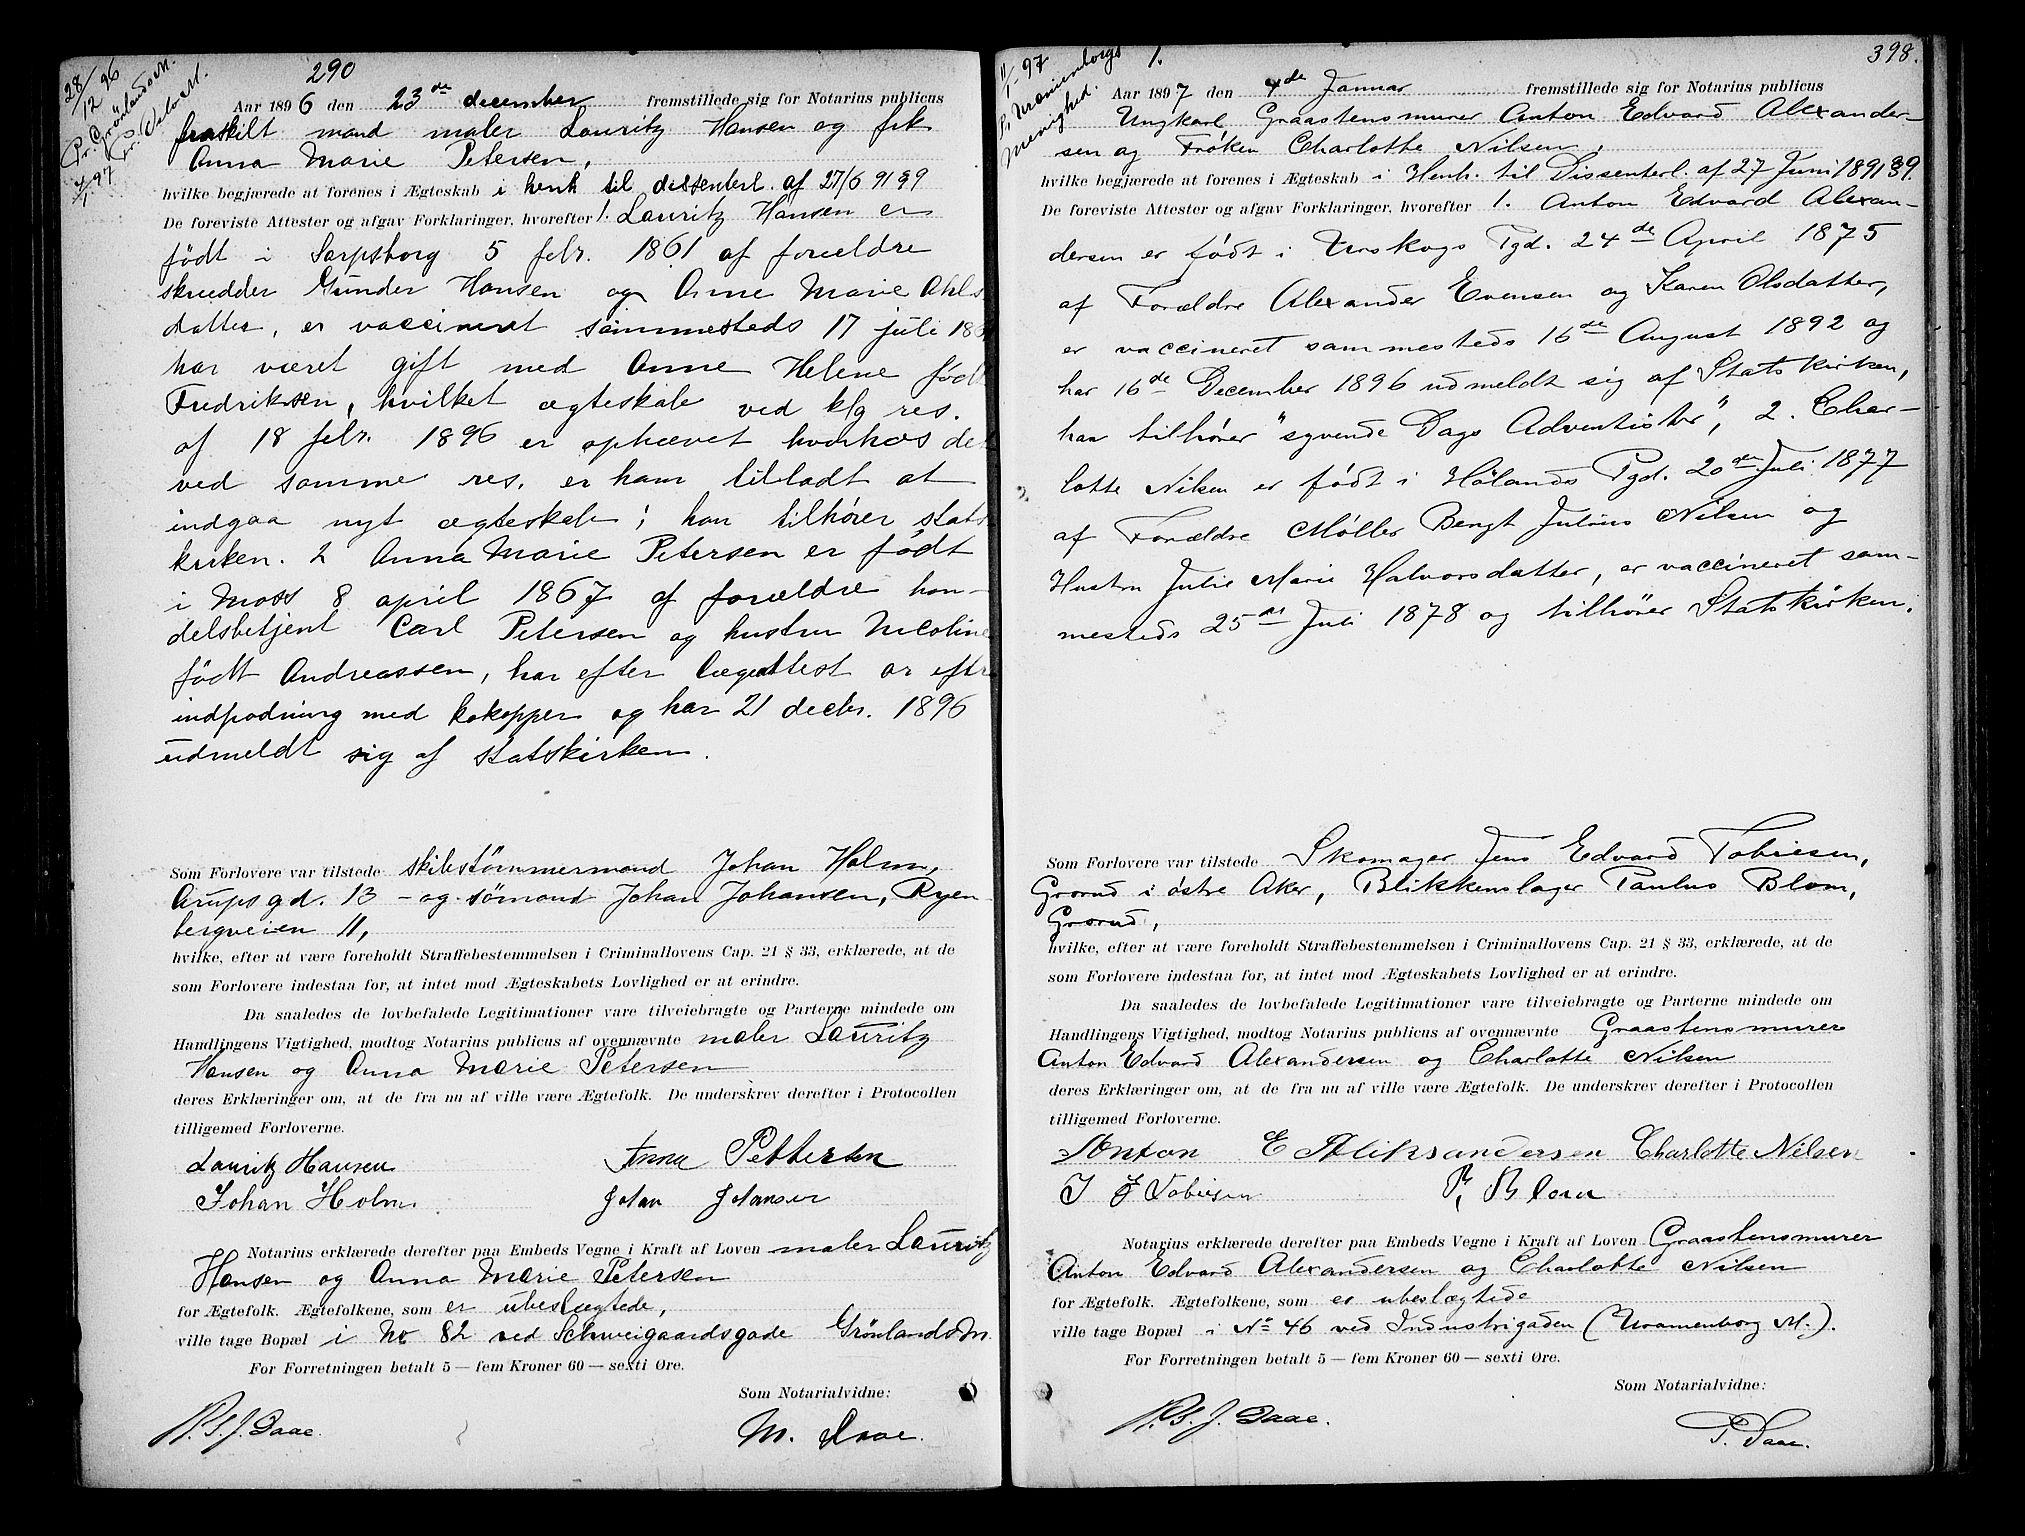 SAO, Oslo byfogd avd. I, L/Lb/Lbb/L0002: Notarialprotokoll, rekke II: Vigsler, 1893-1897, s. 397b-398a